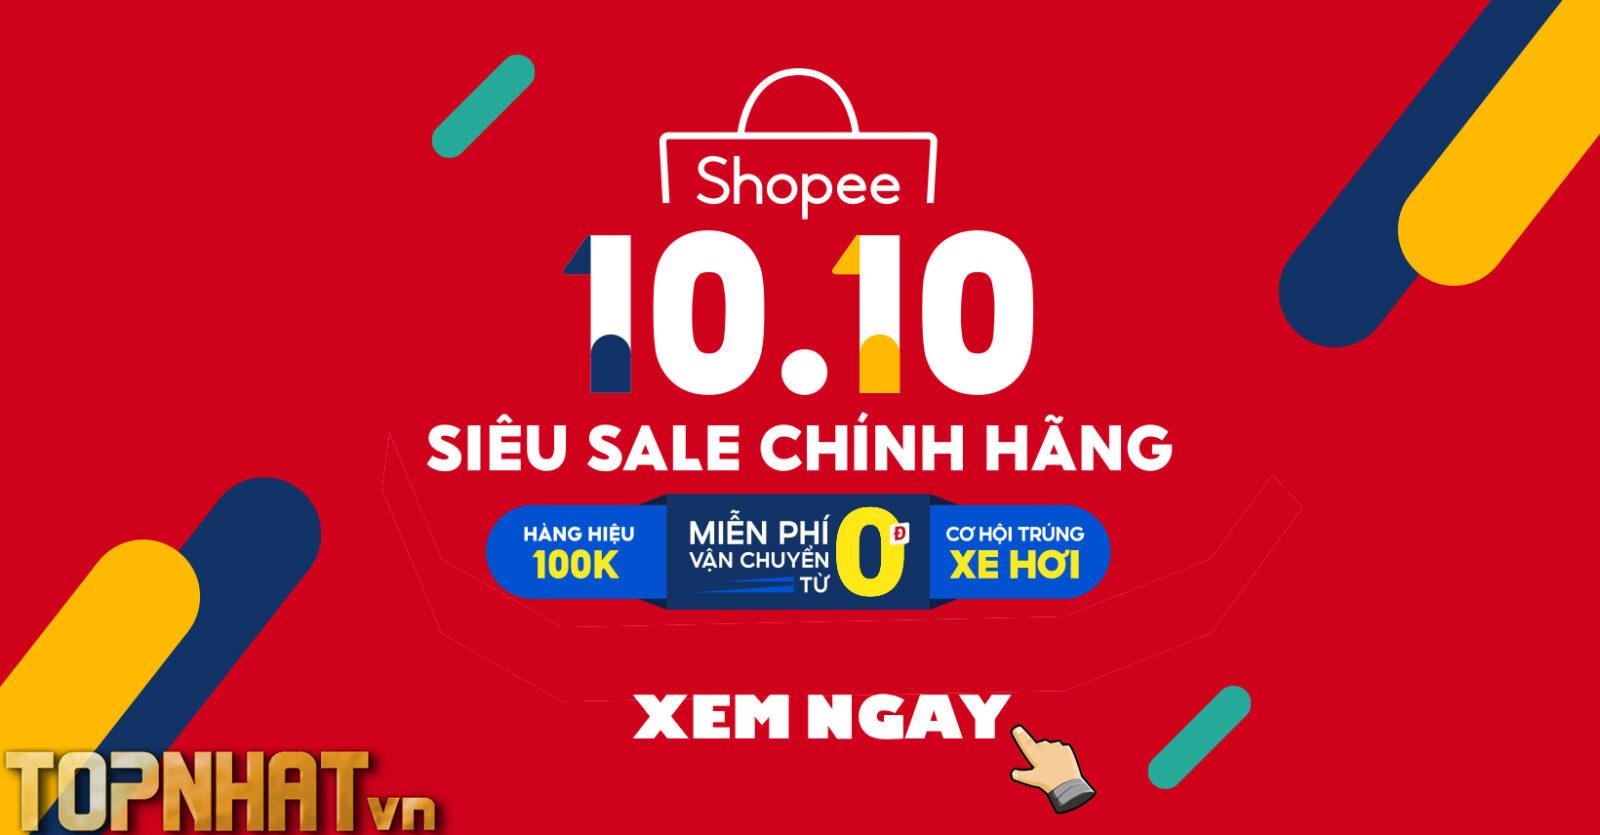 1010 shopee